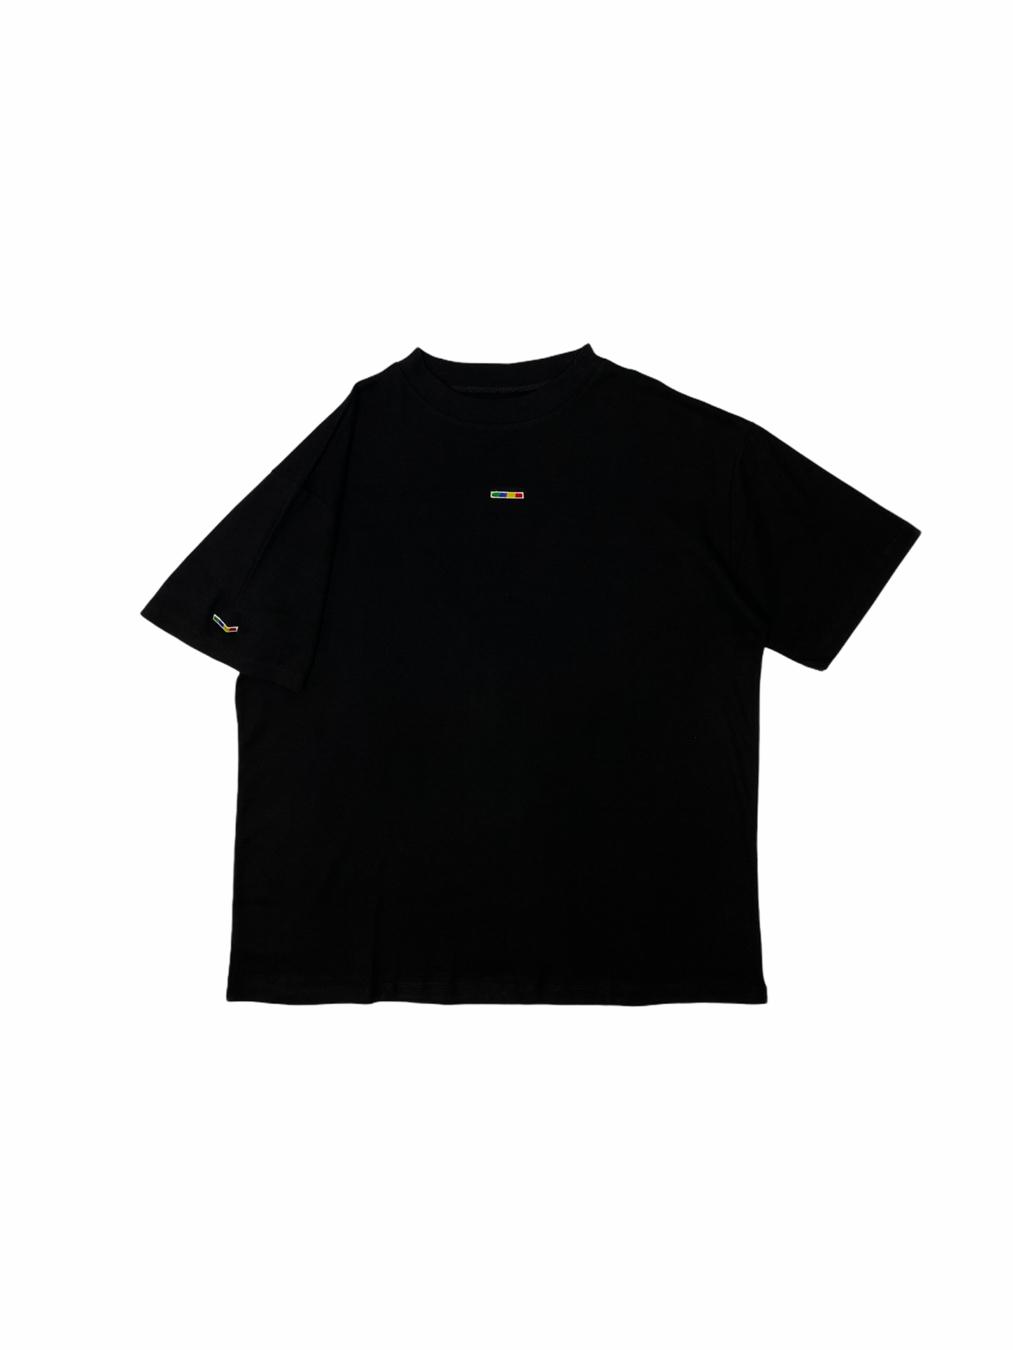 Surway Logo T- Shirt (Black)